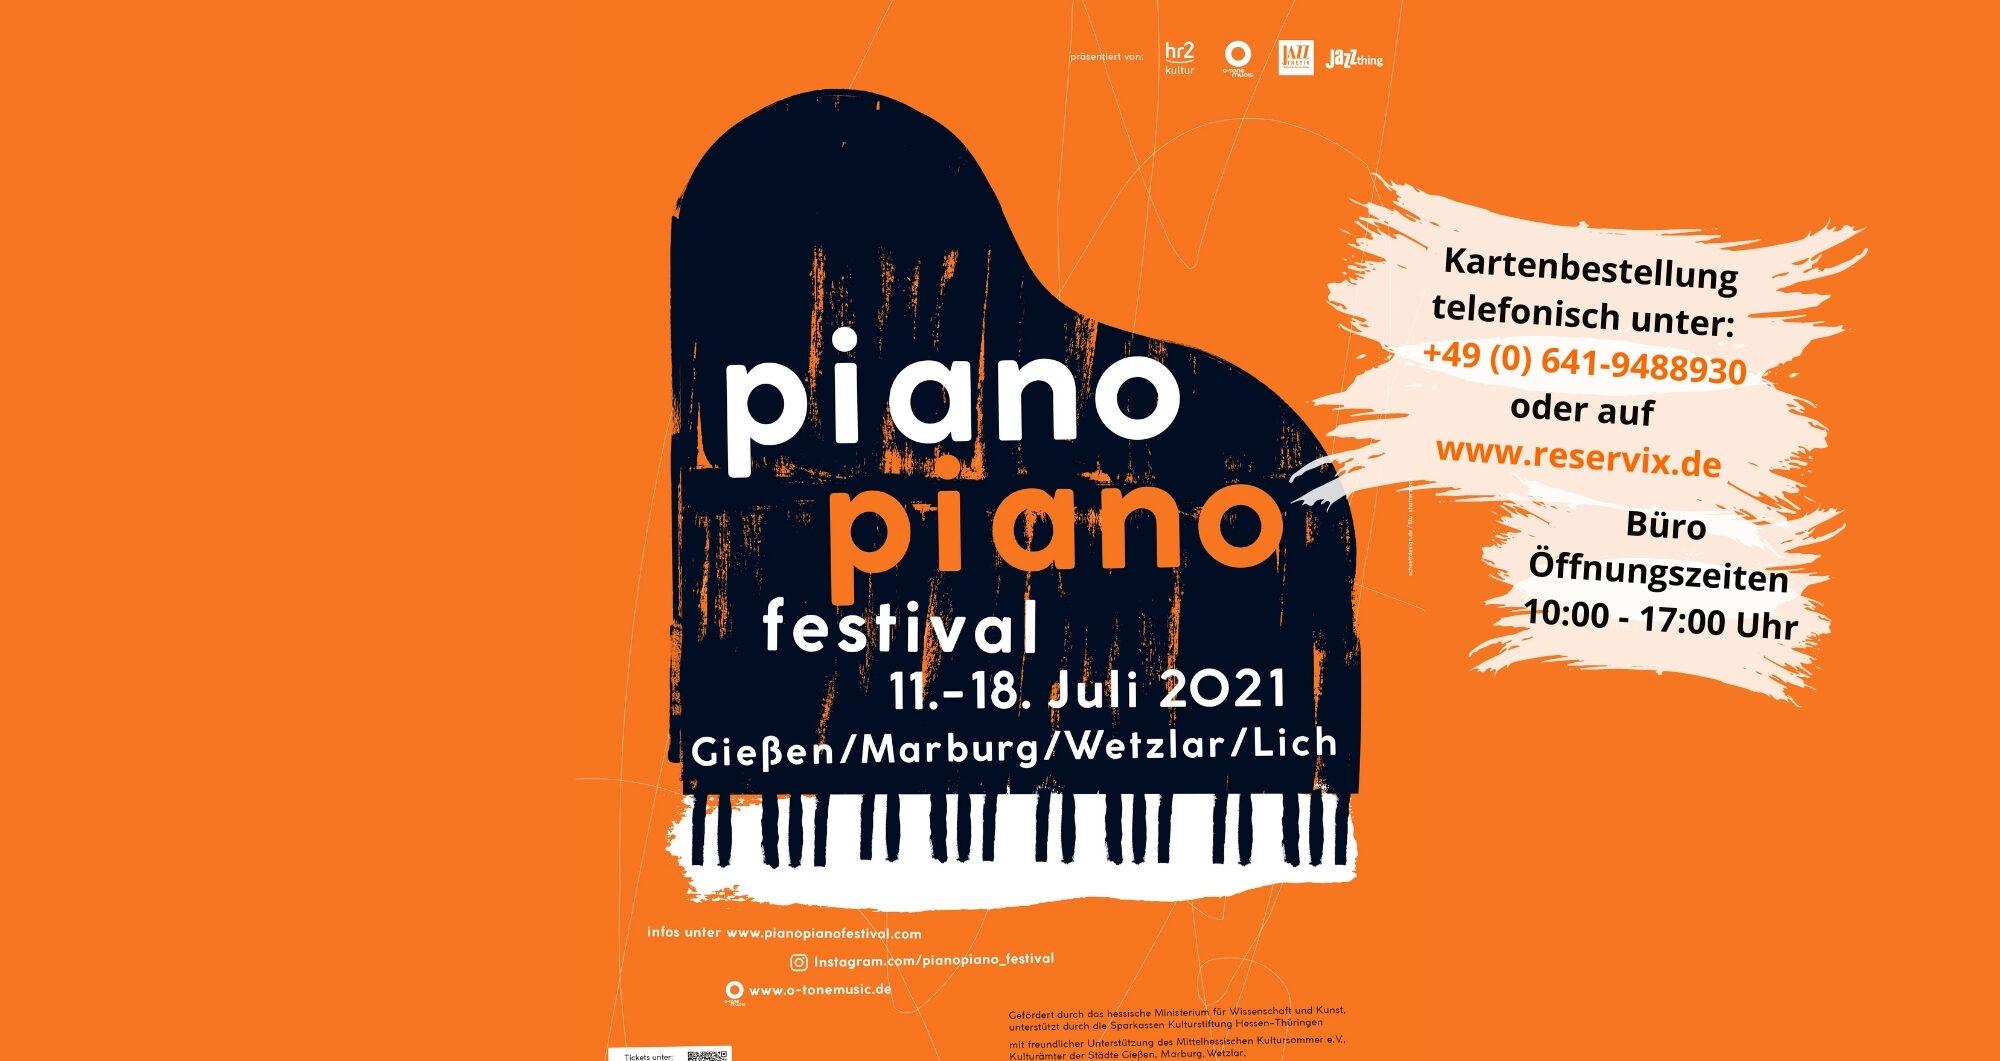 PIANO PIANO FESTIVAL - coming soon - Mittelhessen